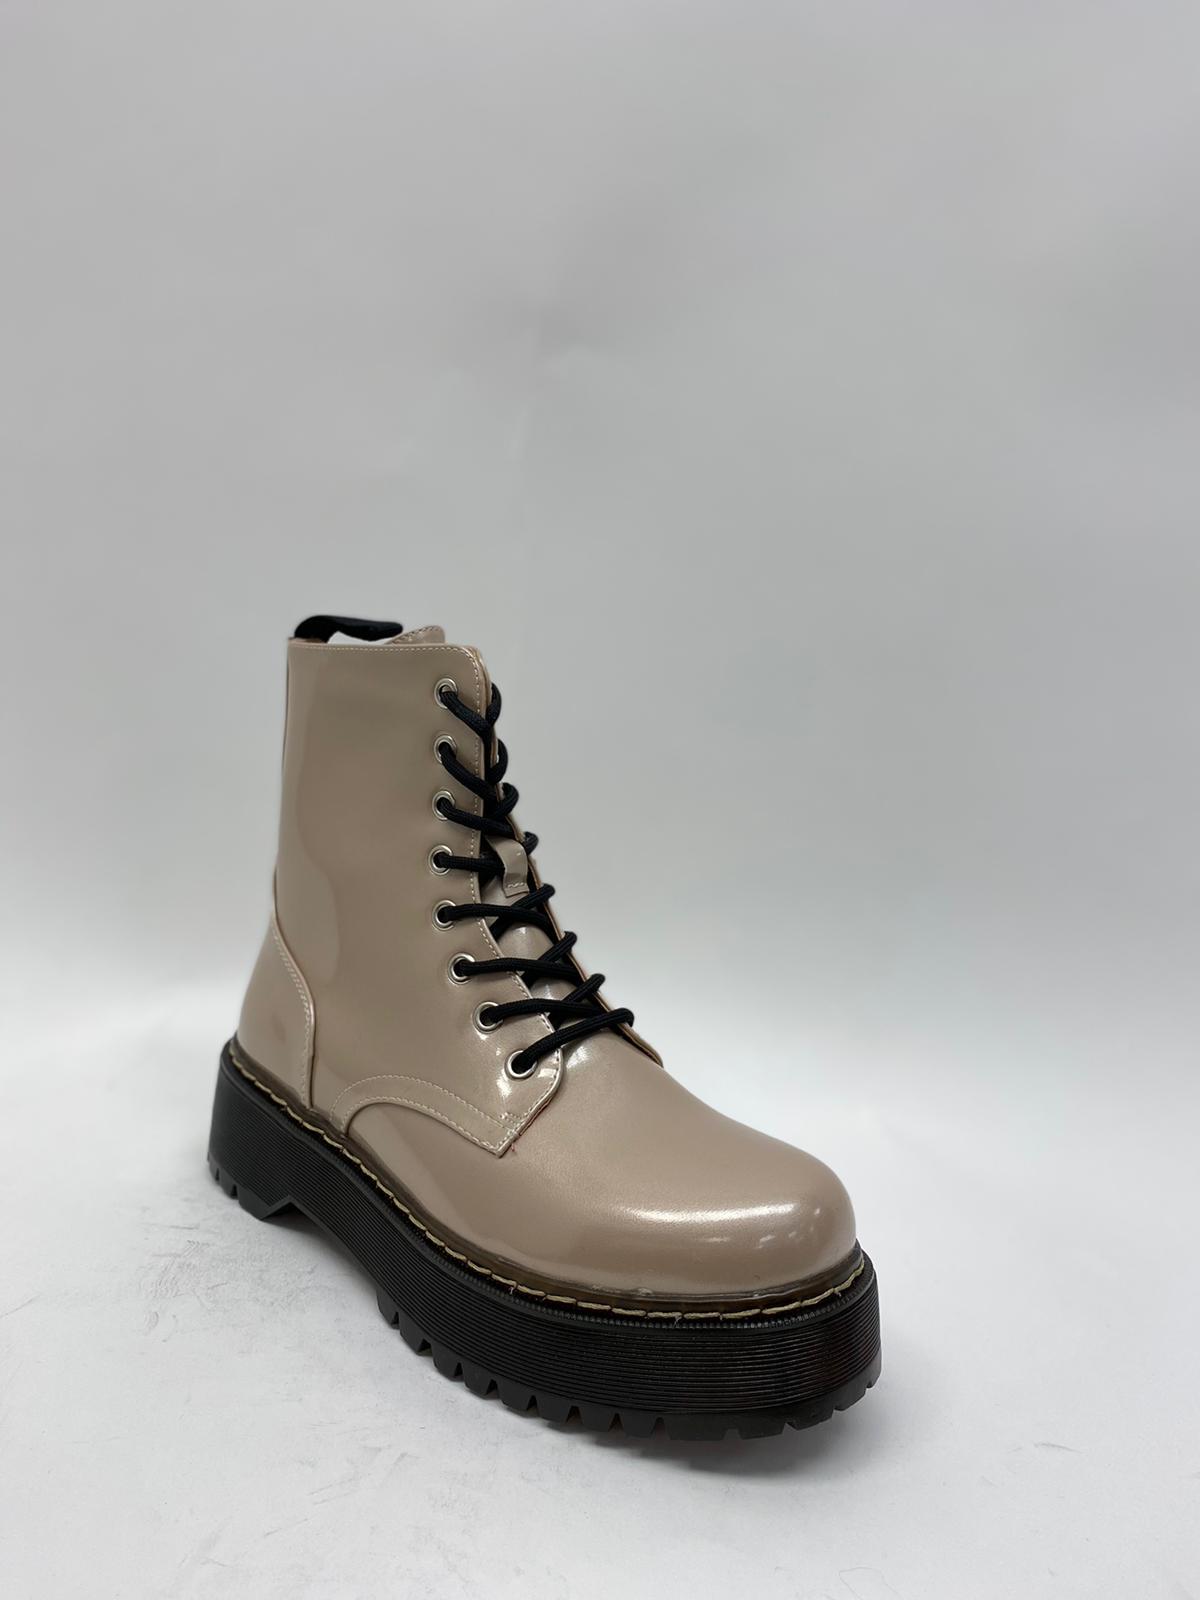 Stiefel beige in Glanzoptik